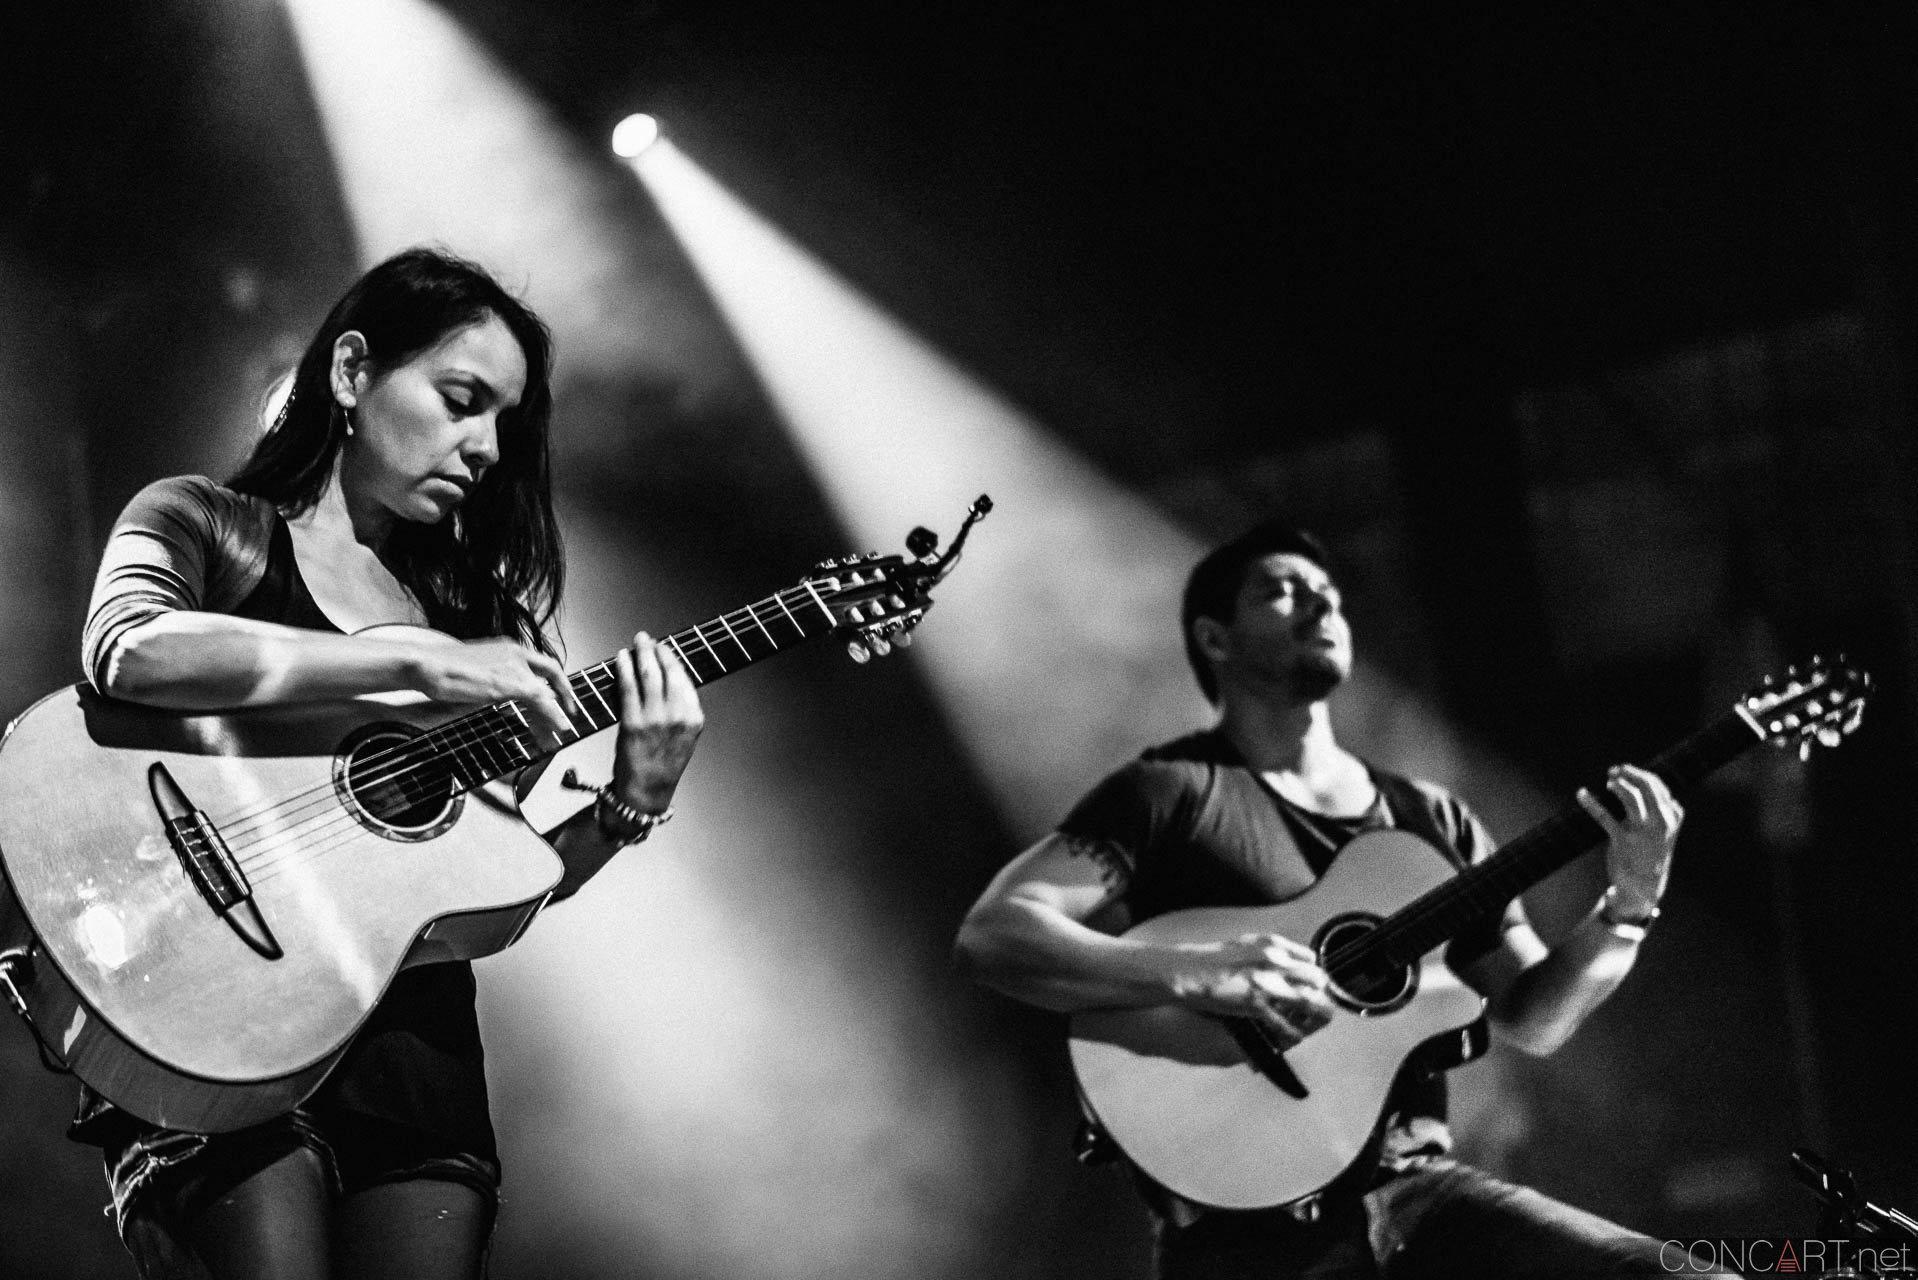 Rodrigo y Gabriela photo by Sean Molin. concART   The Art Of Live  48